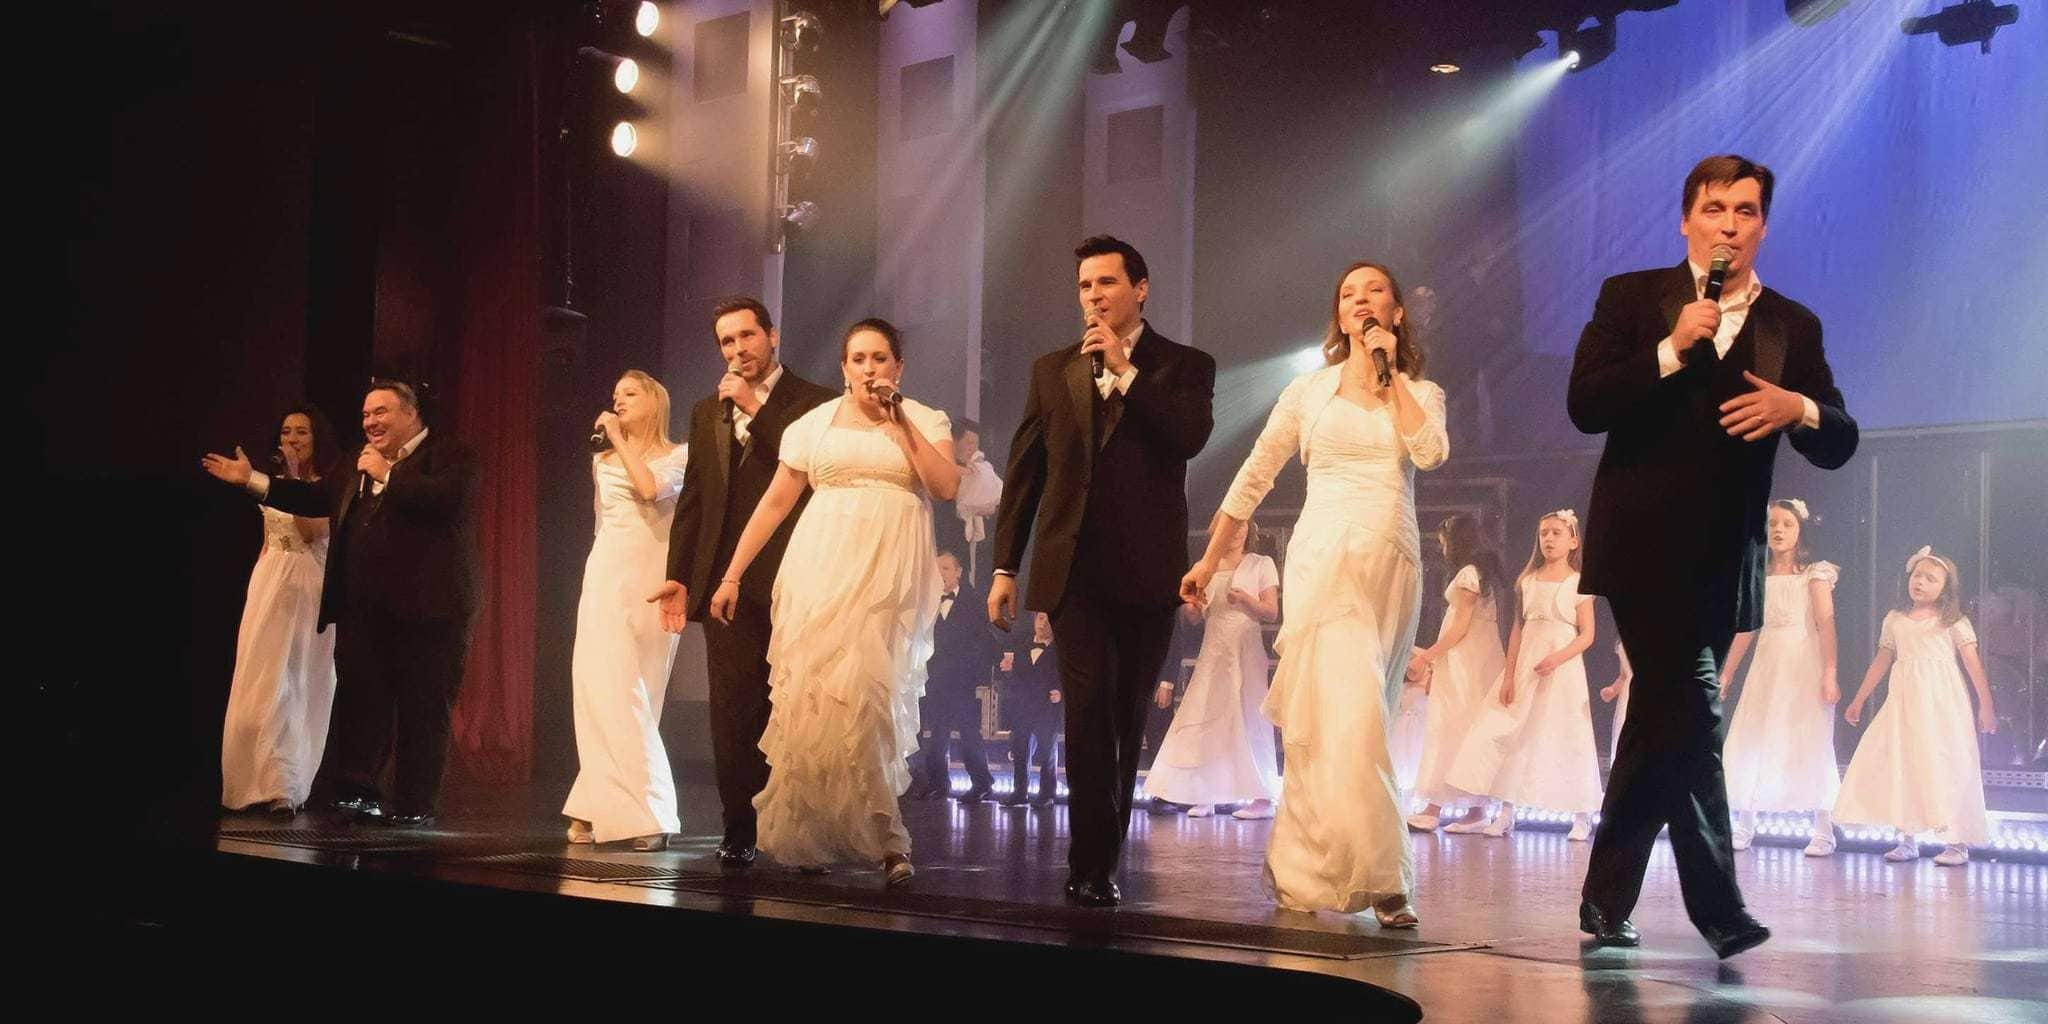 hughes music show, branson entertainment, branson theatre